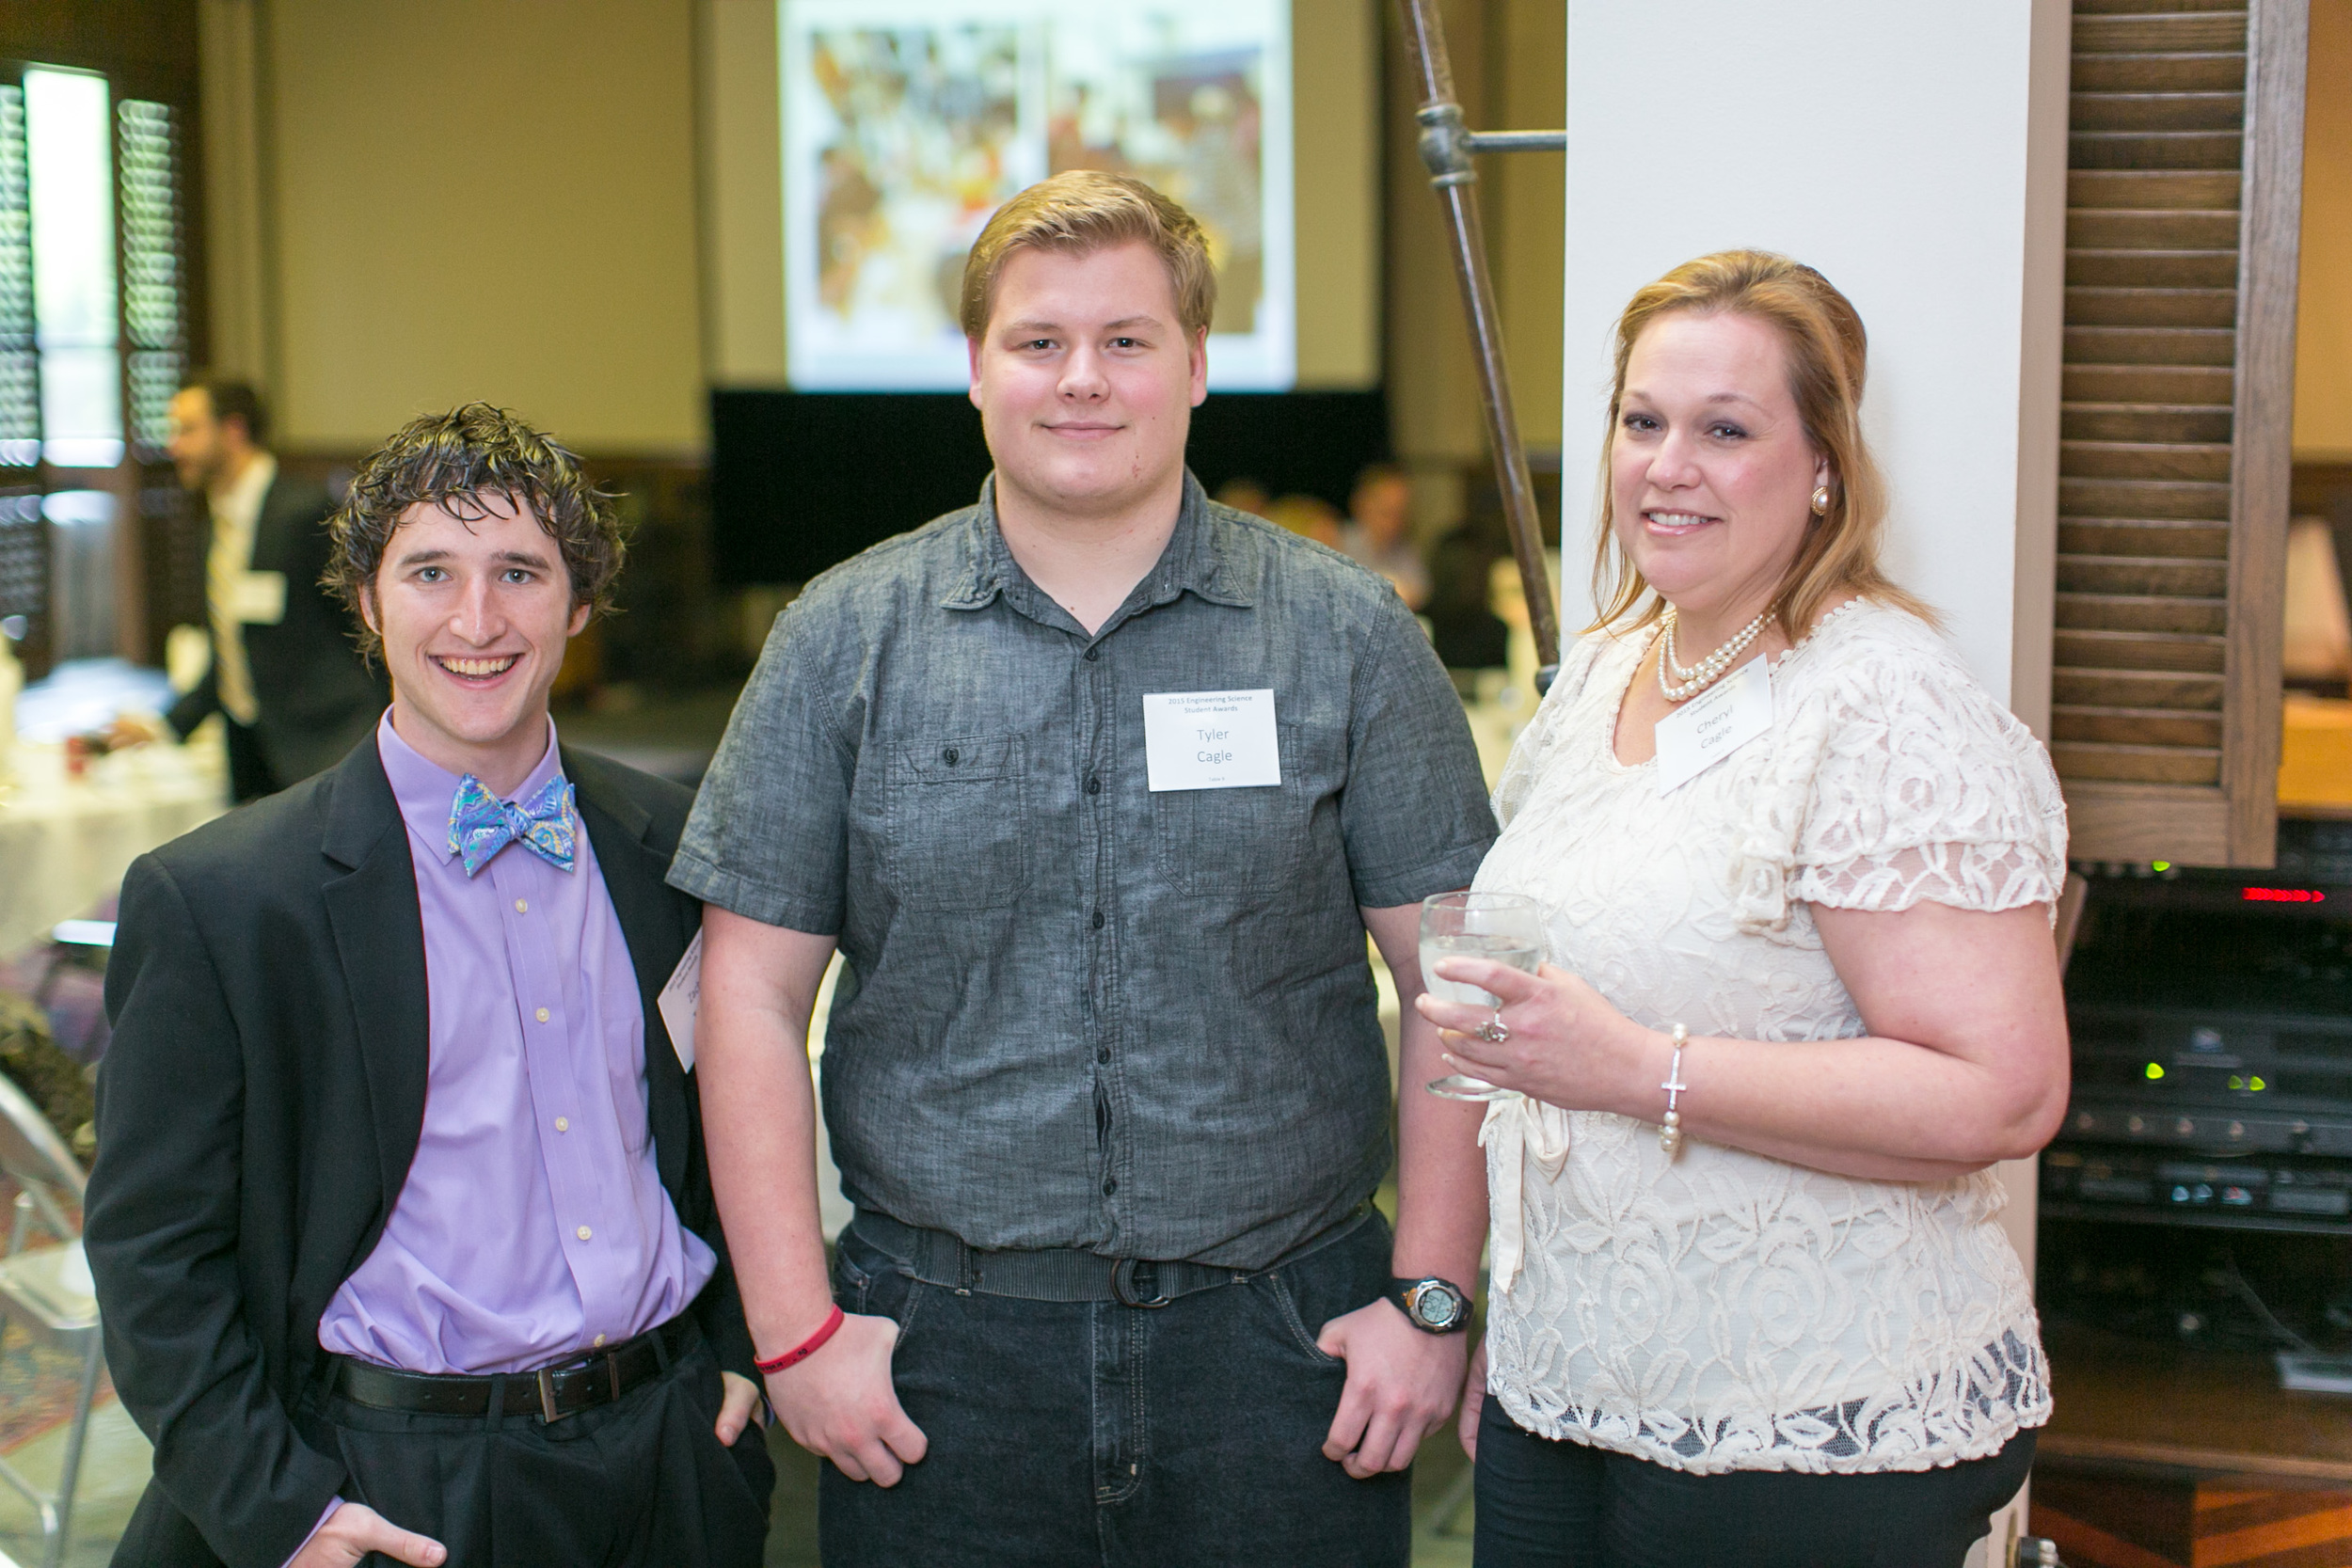 044-Engineering Awards.jpg